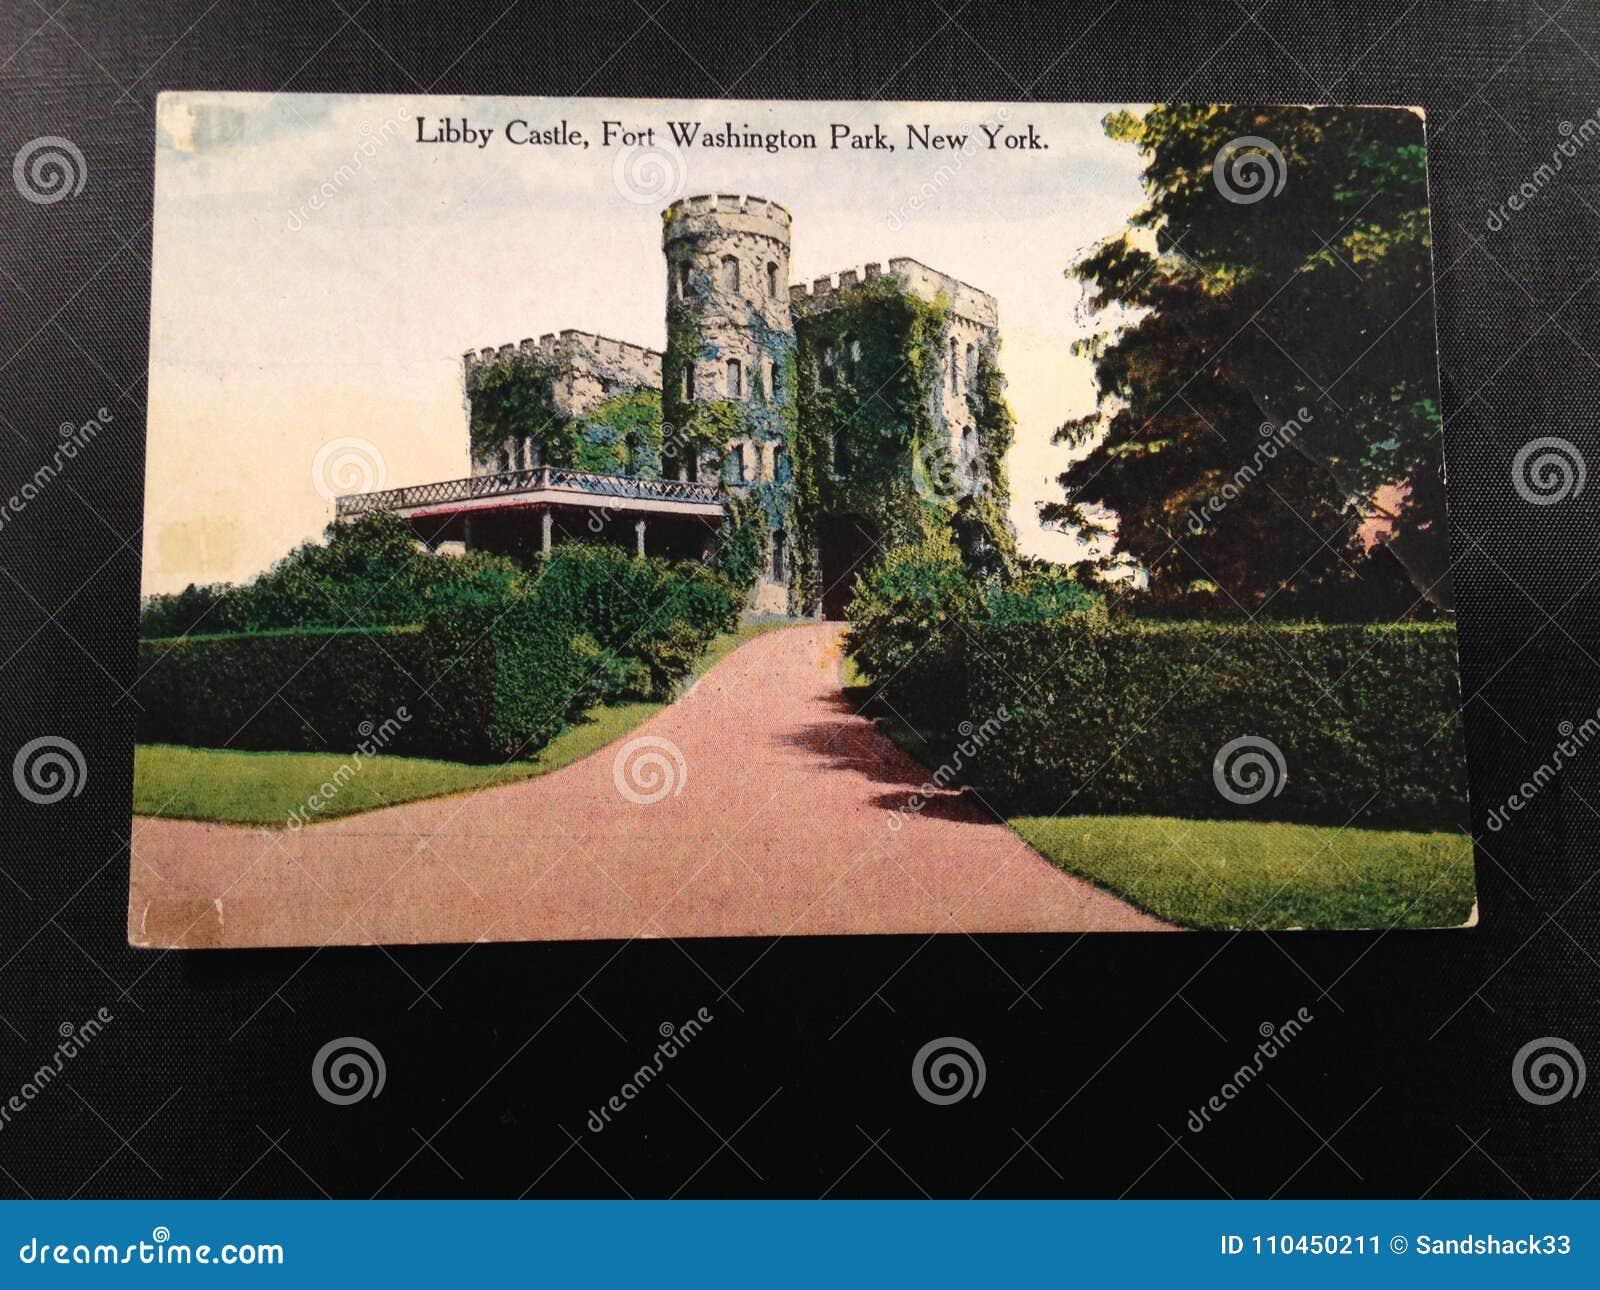 Libby Castle